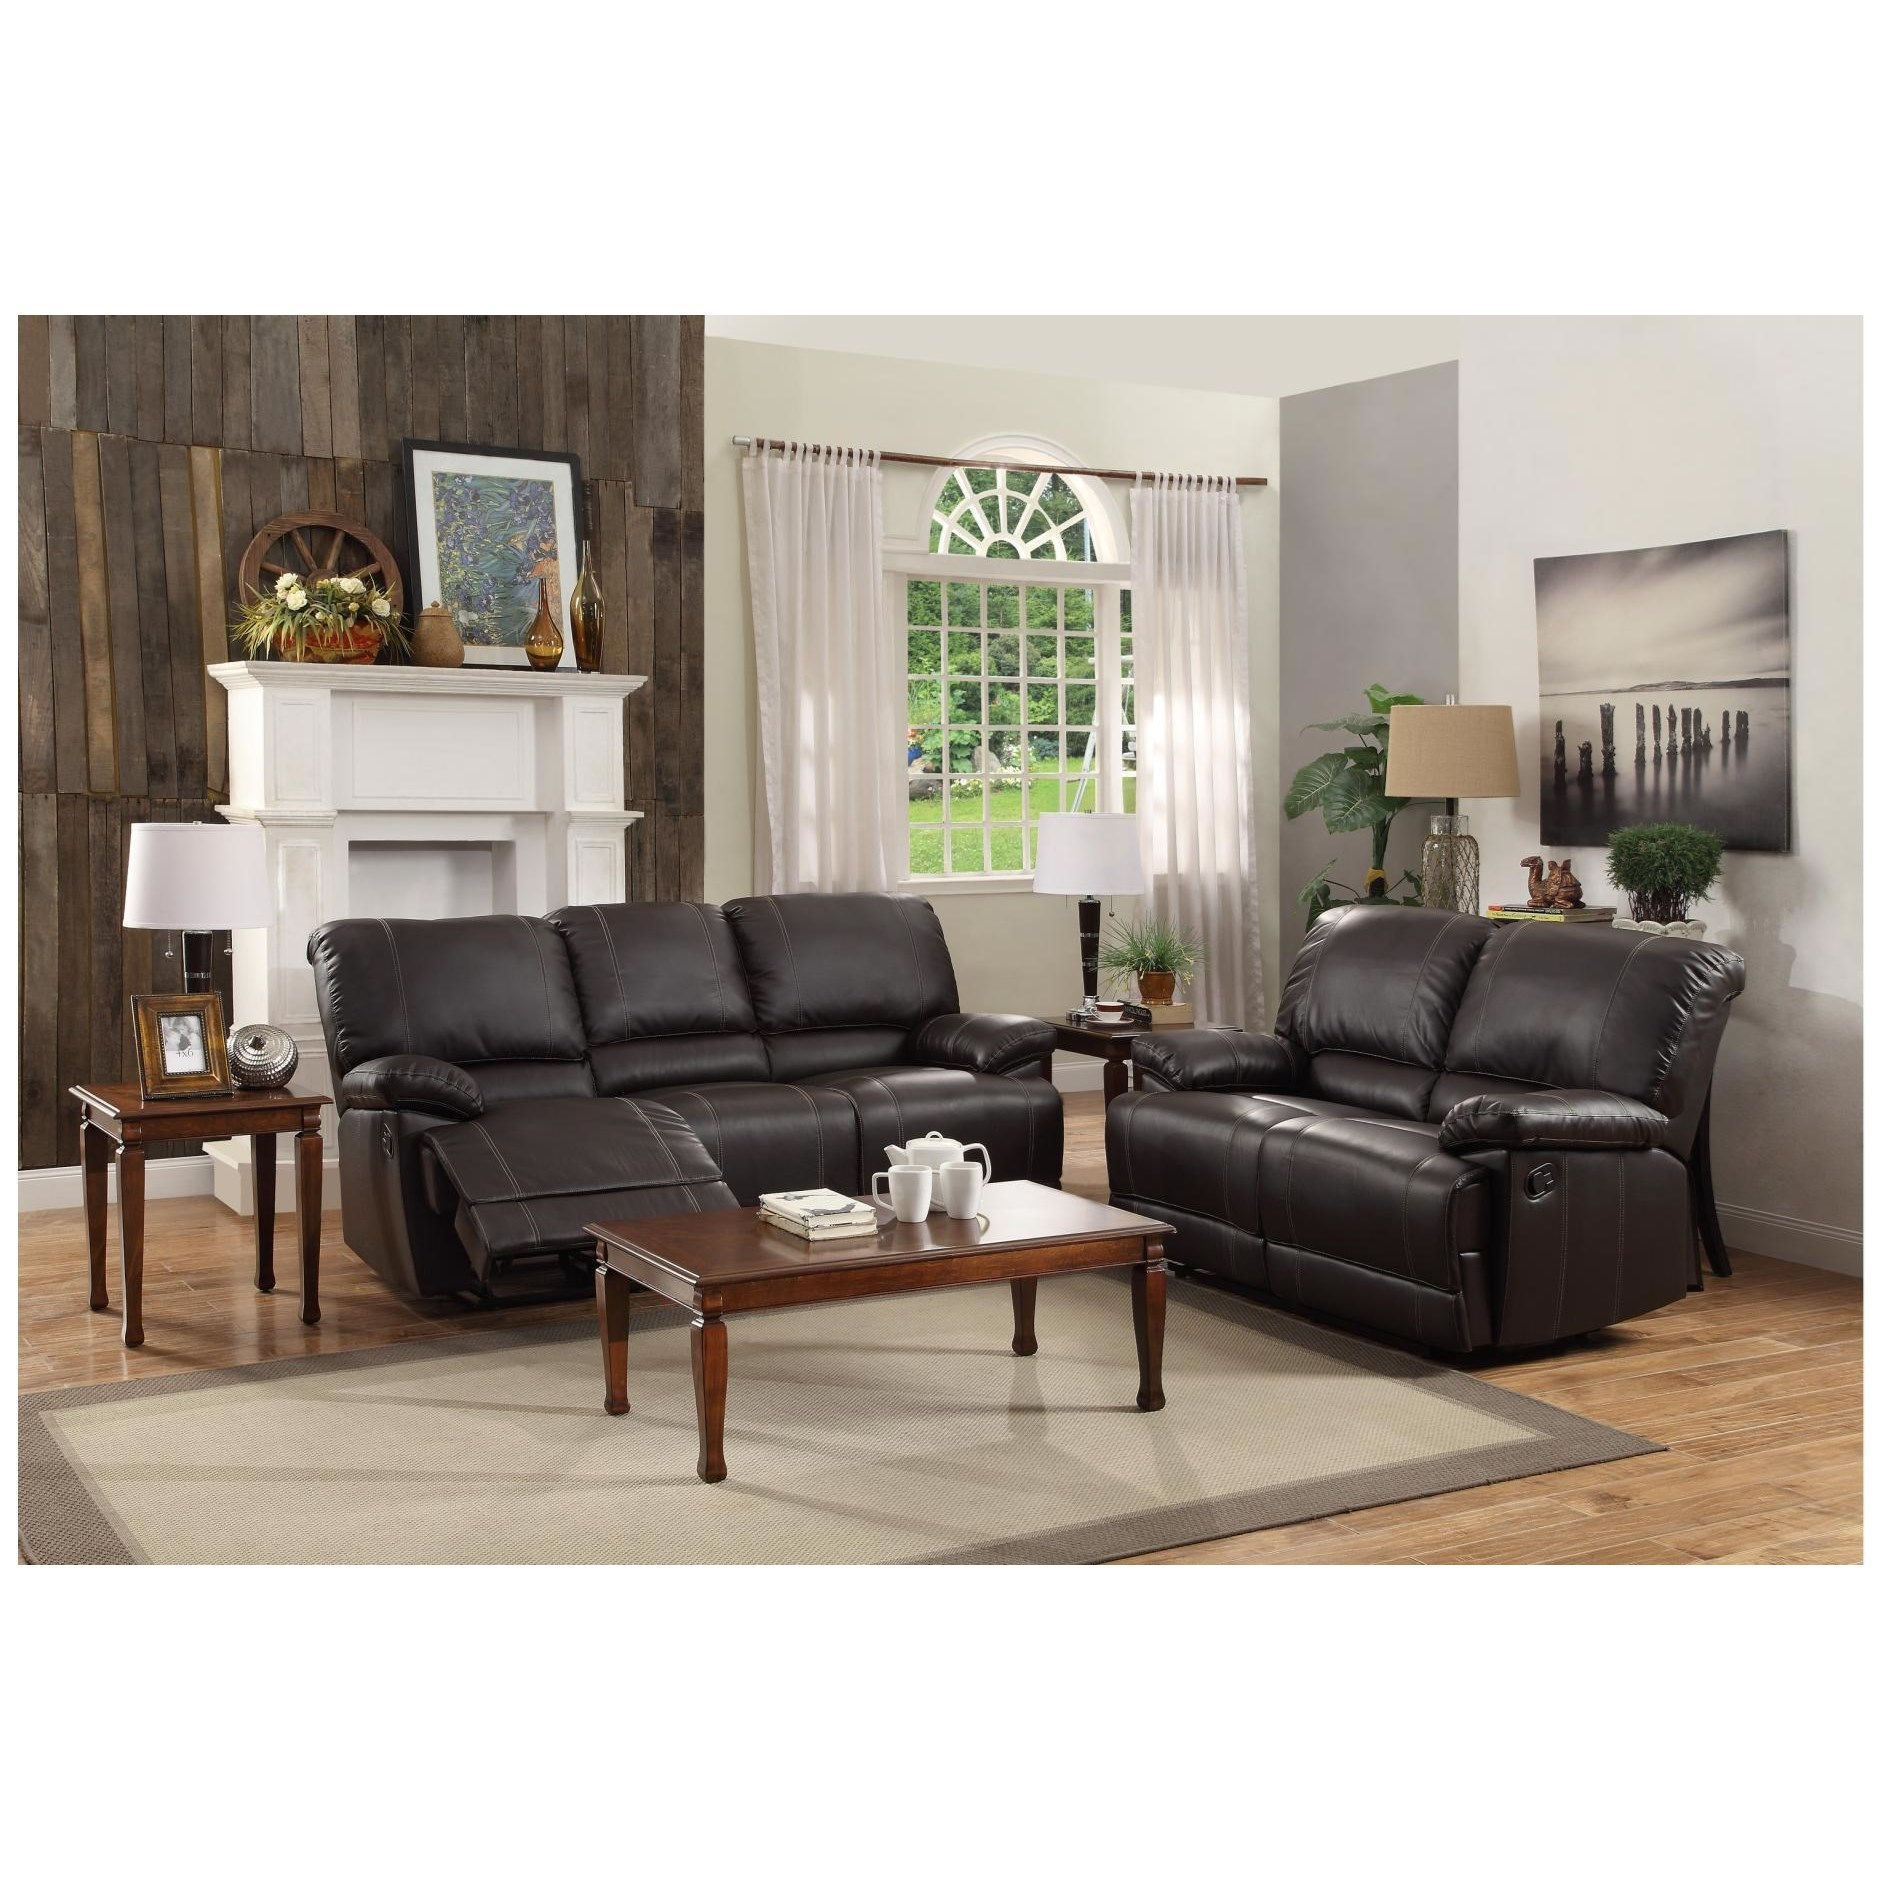 Homelegance Cassville Reclining Living Room Group | Value ...